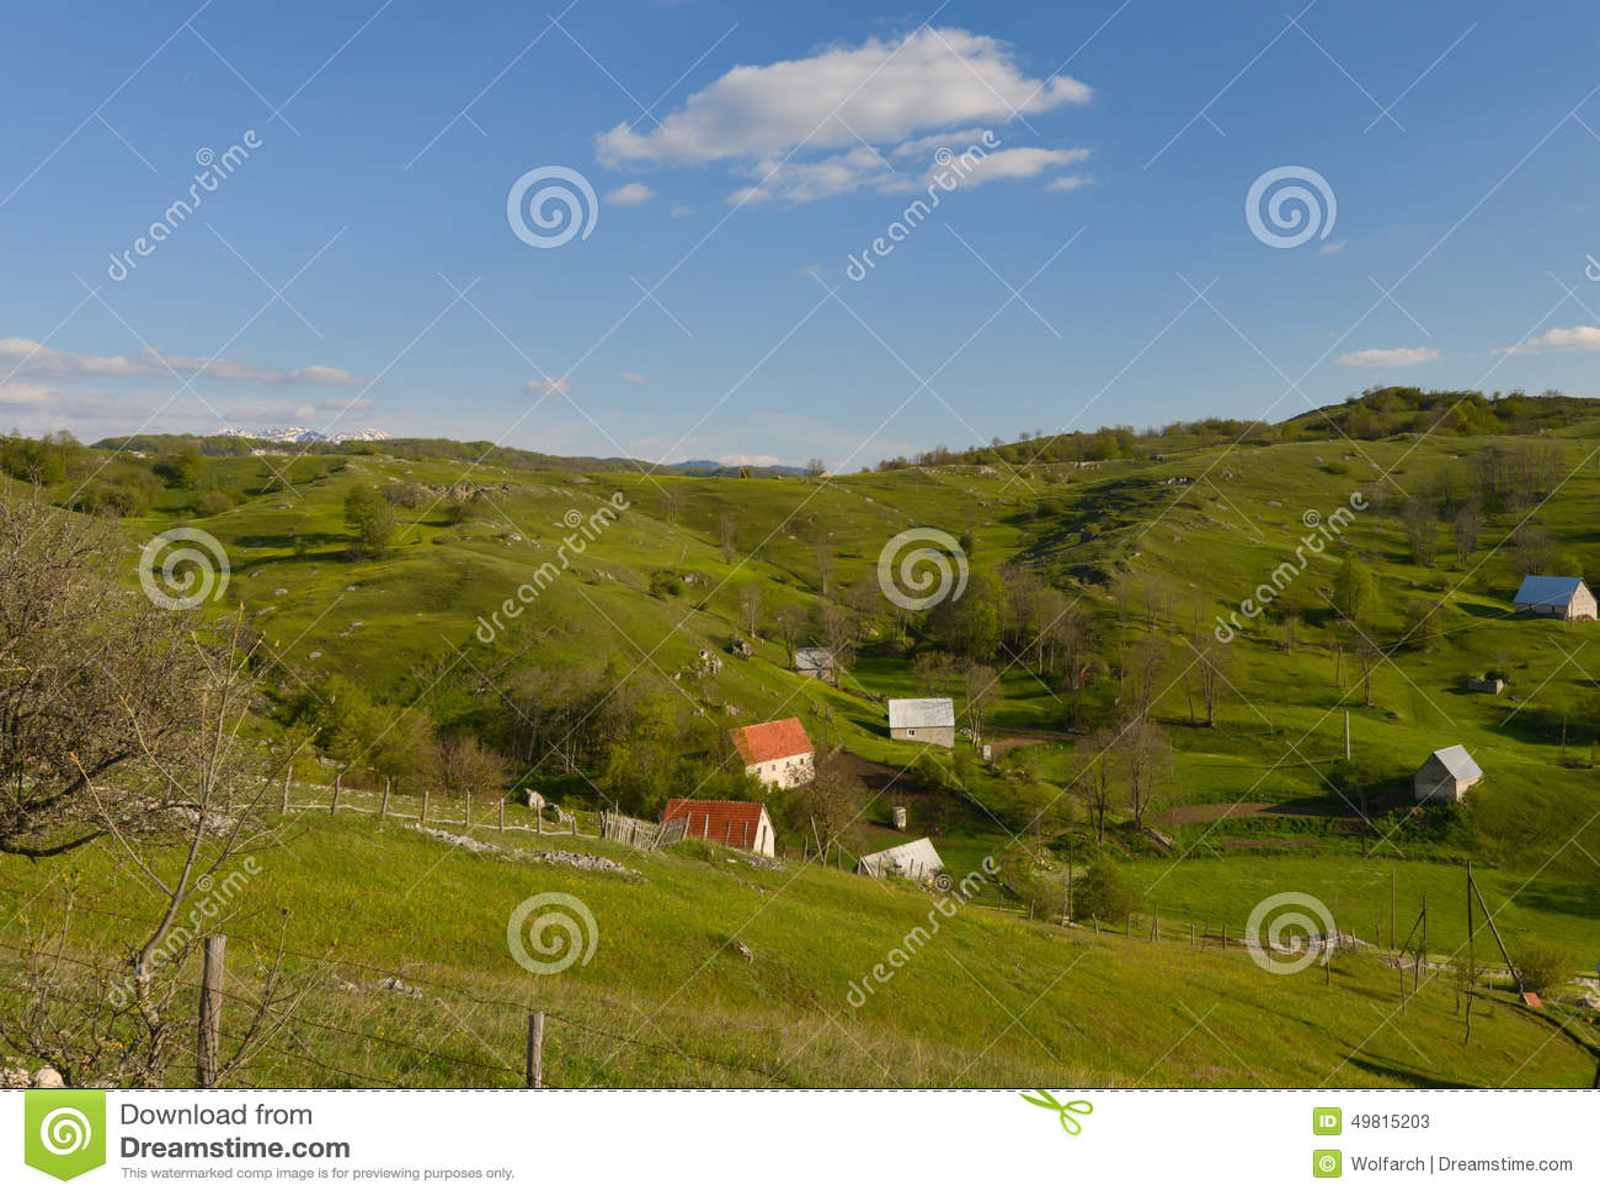 A small village in Montenegro